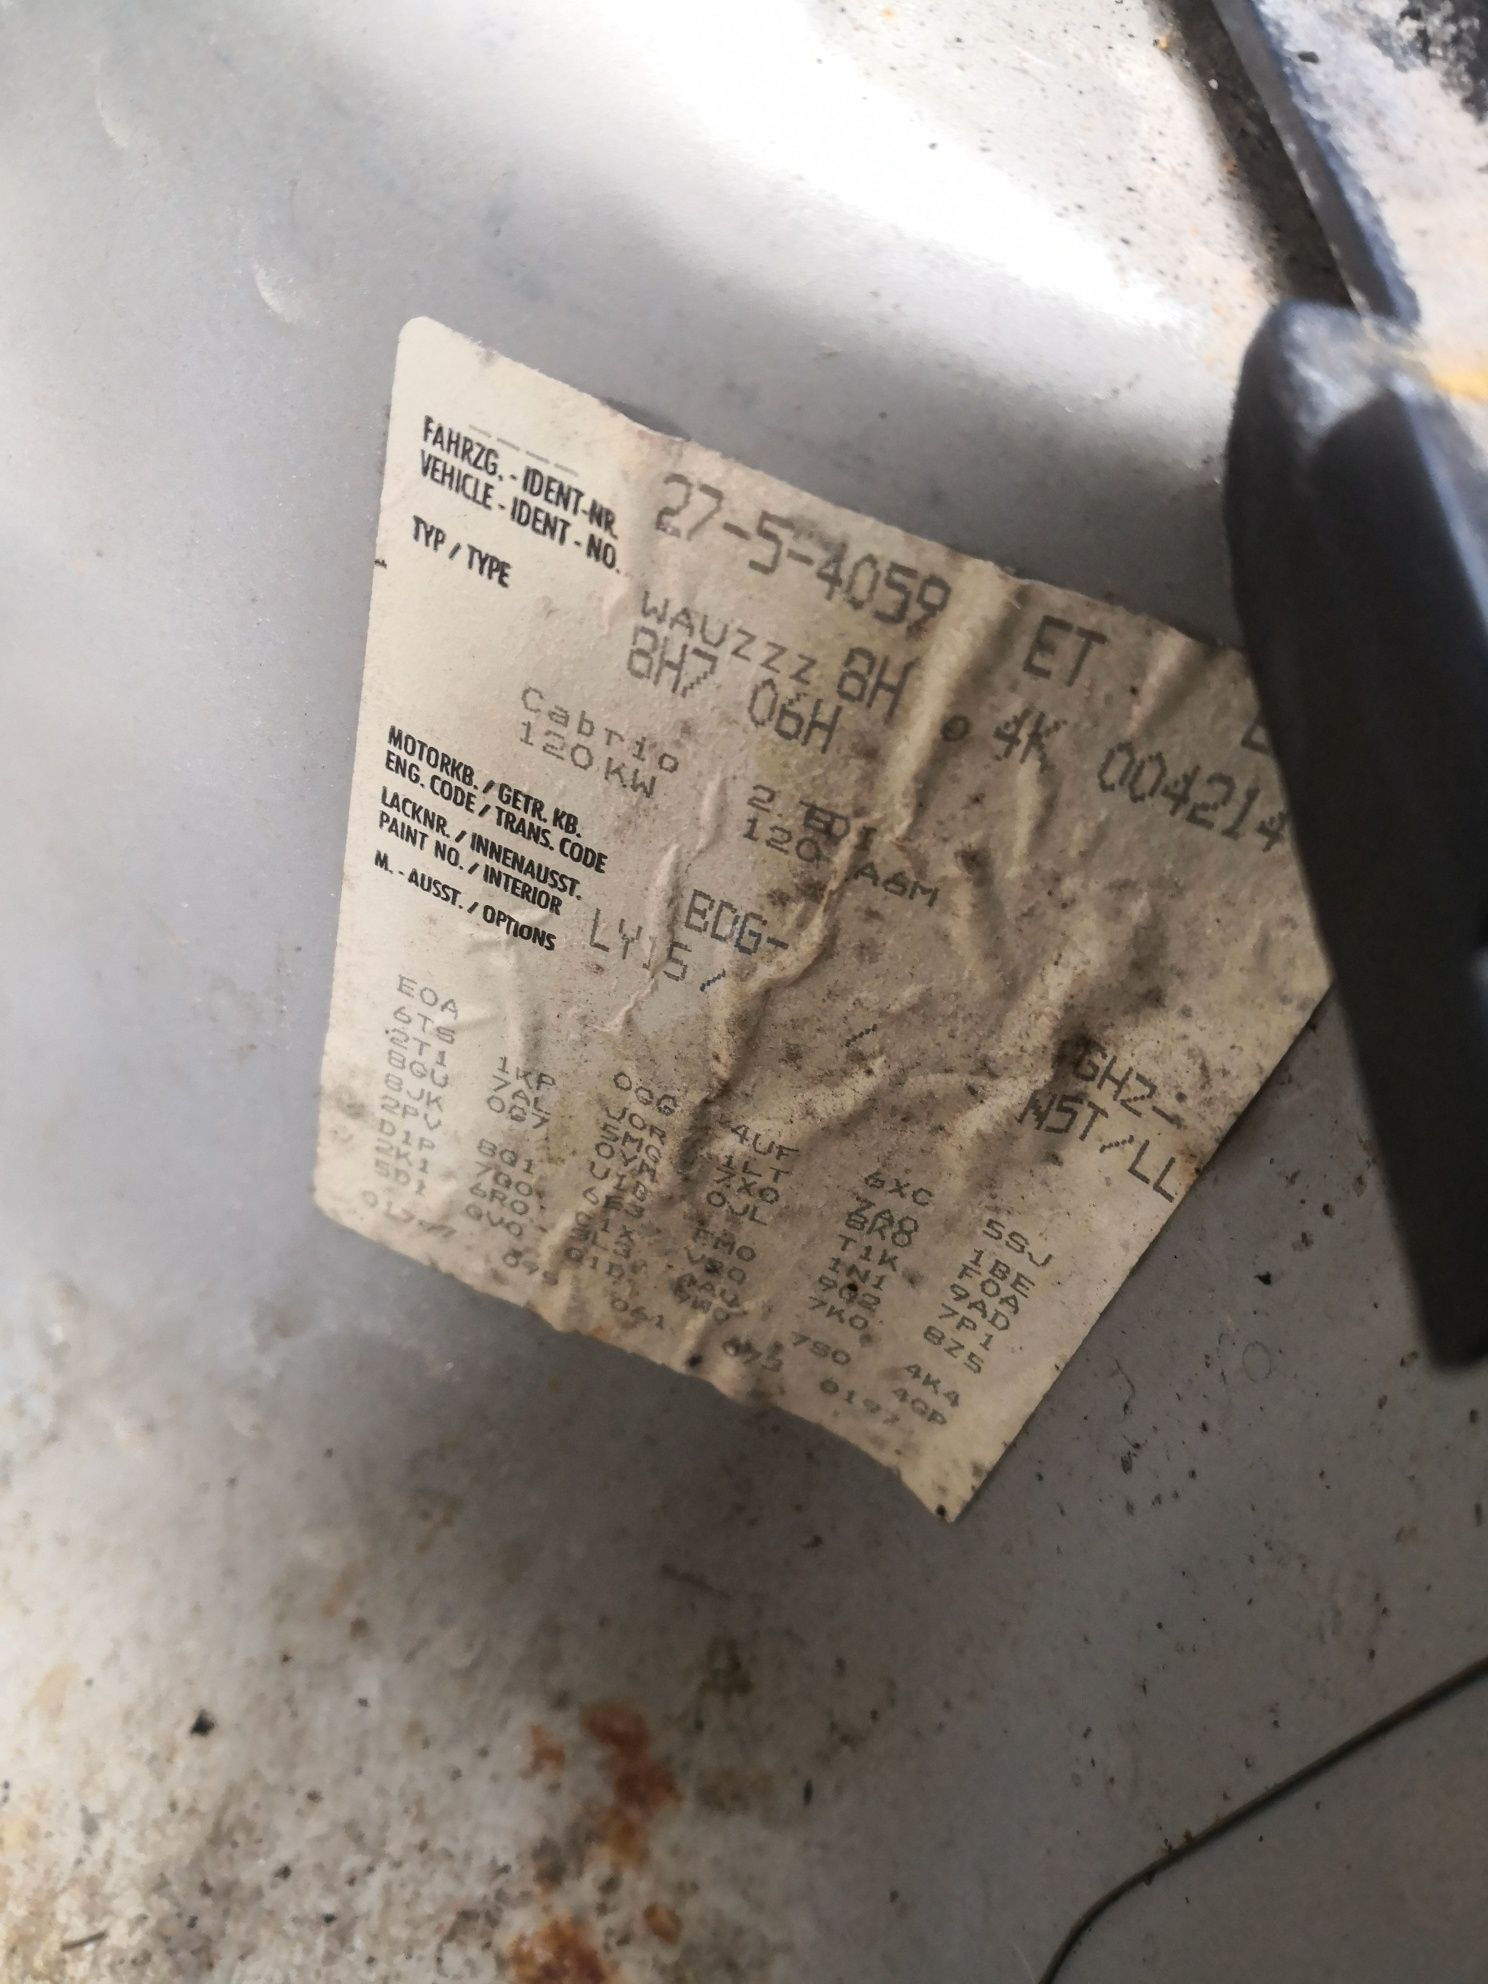 Piese ușa cutoe automata fuzeta planetara clapeta Audi a4 b6 cabrio